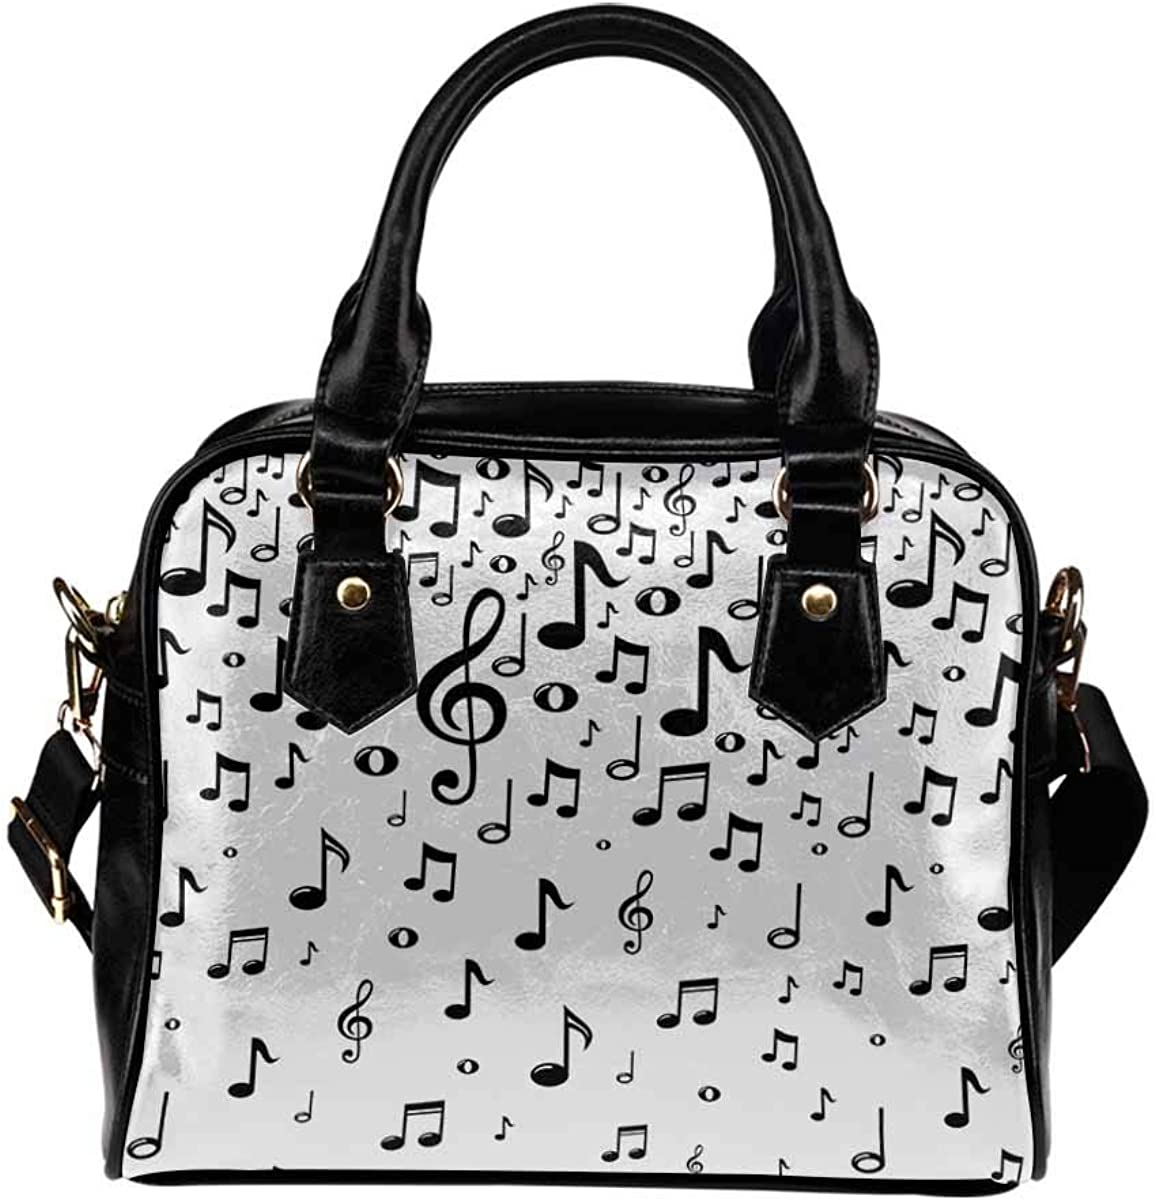 InterestPrint Black Music Notes Womens Top Handle PU Leather Shoulder Satchel Bag